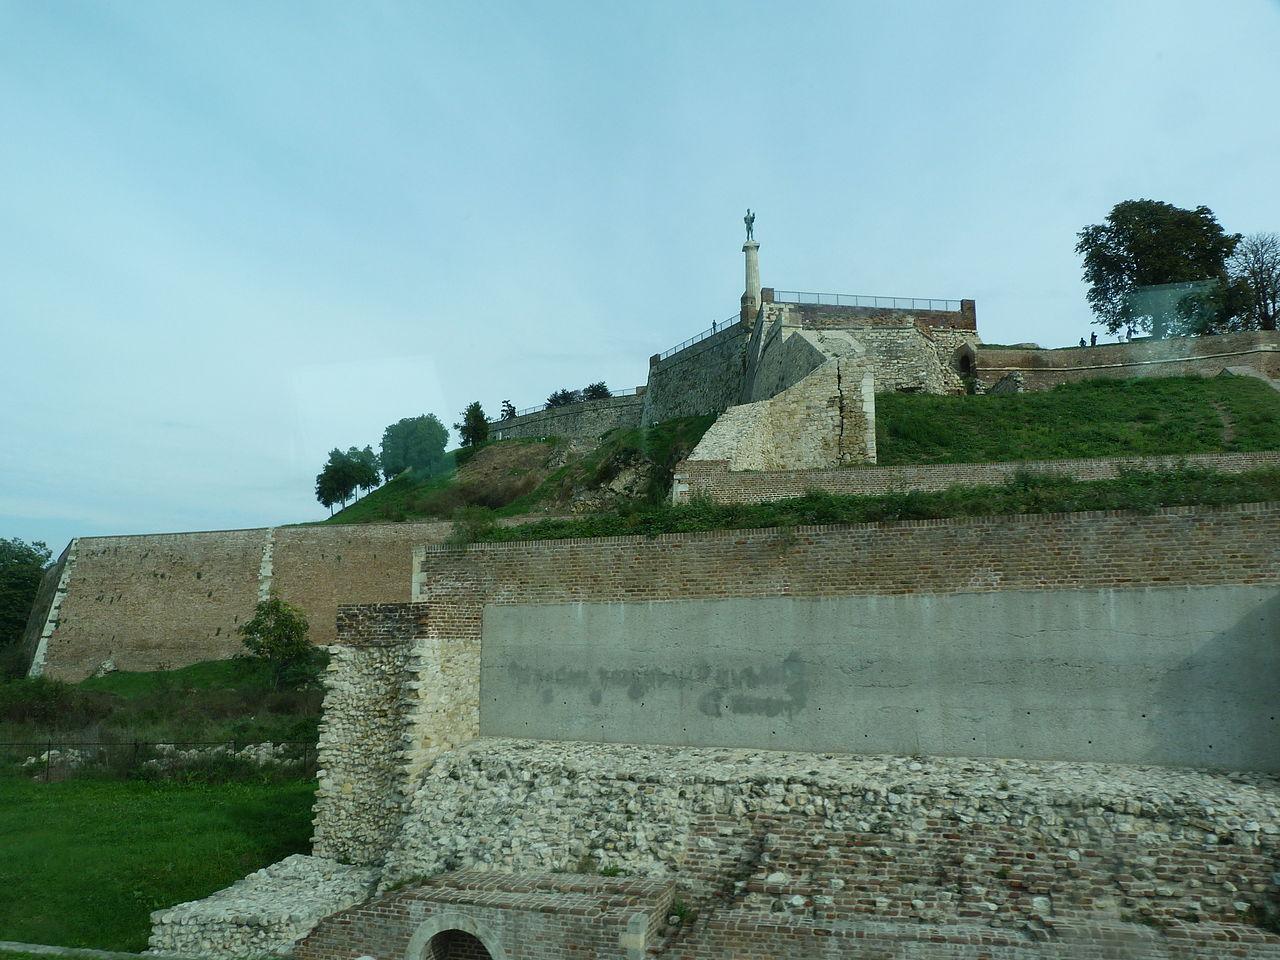 Nándorfehérvár Castle